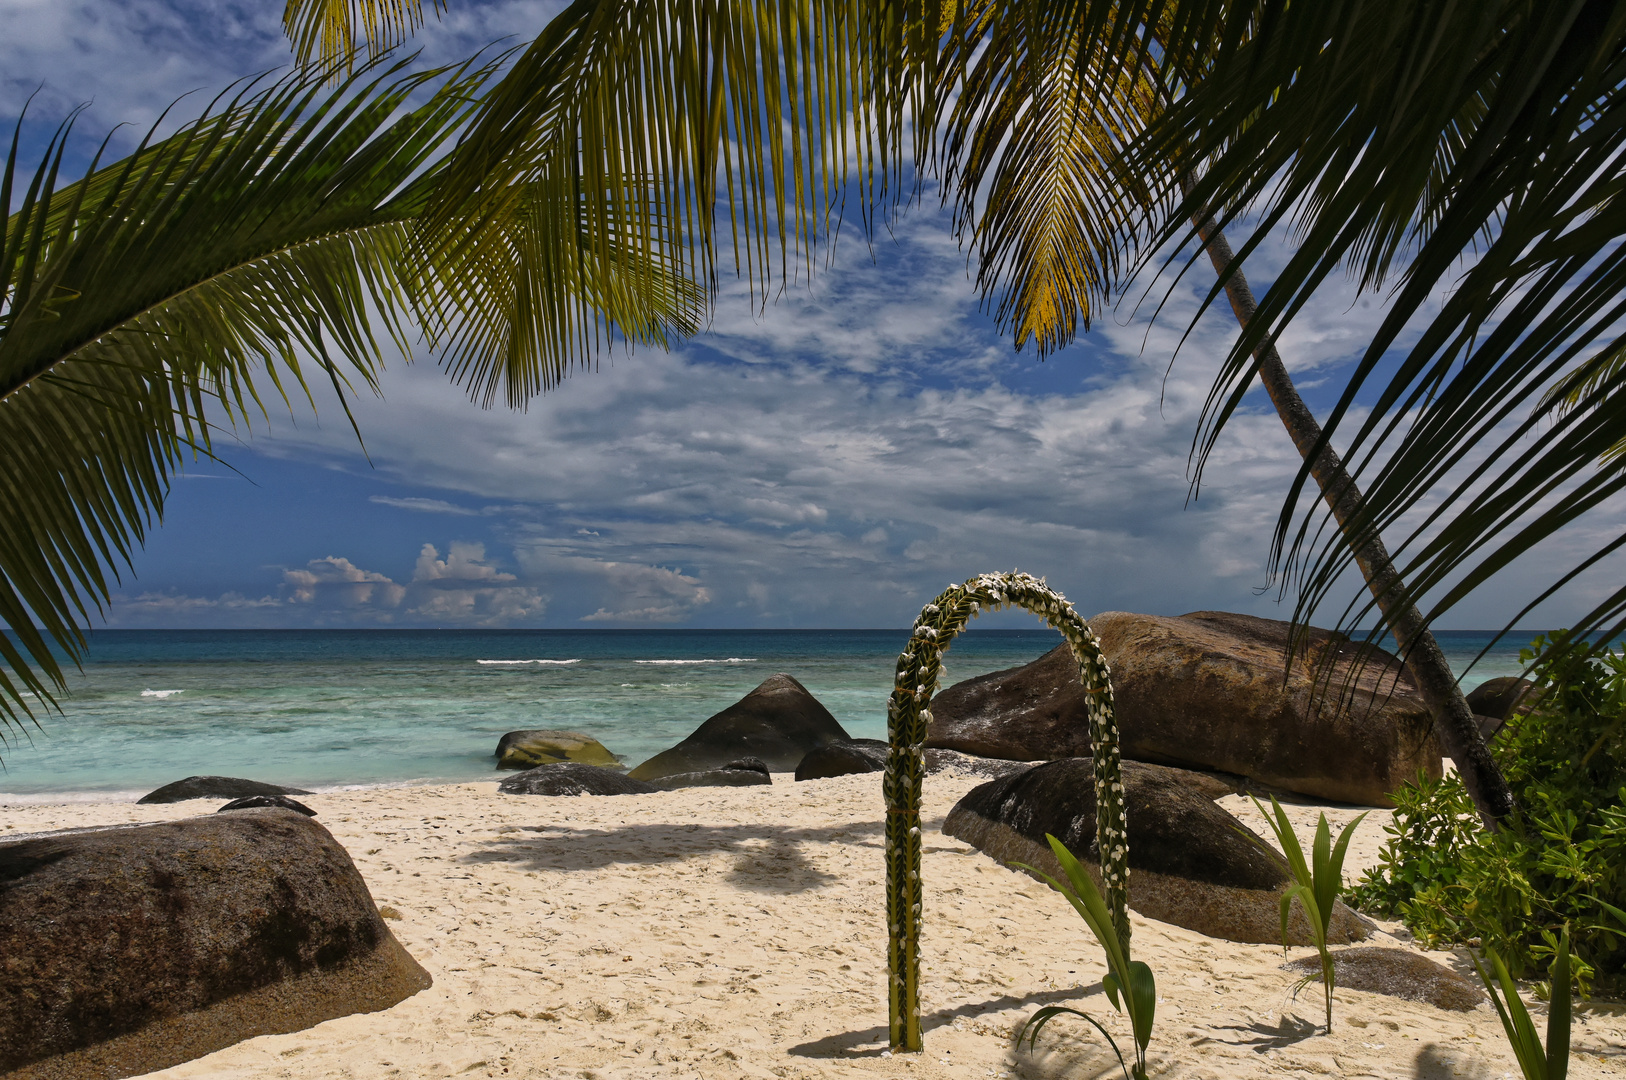 Seychelles - Robinson Crusoe Feeling - Silhuette Island